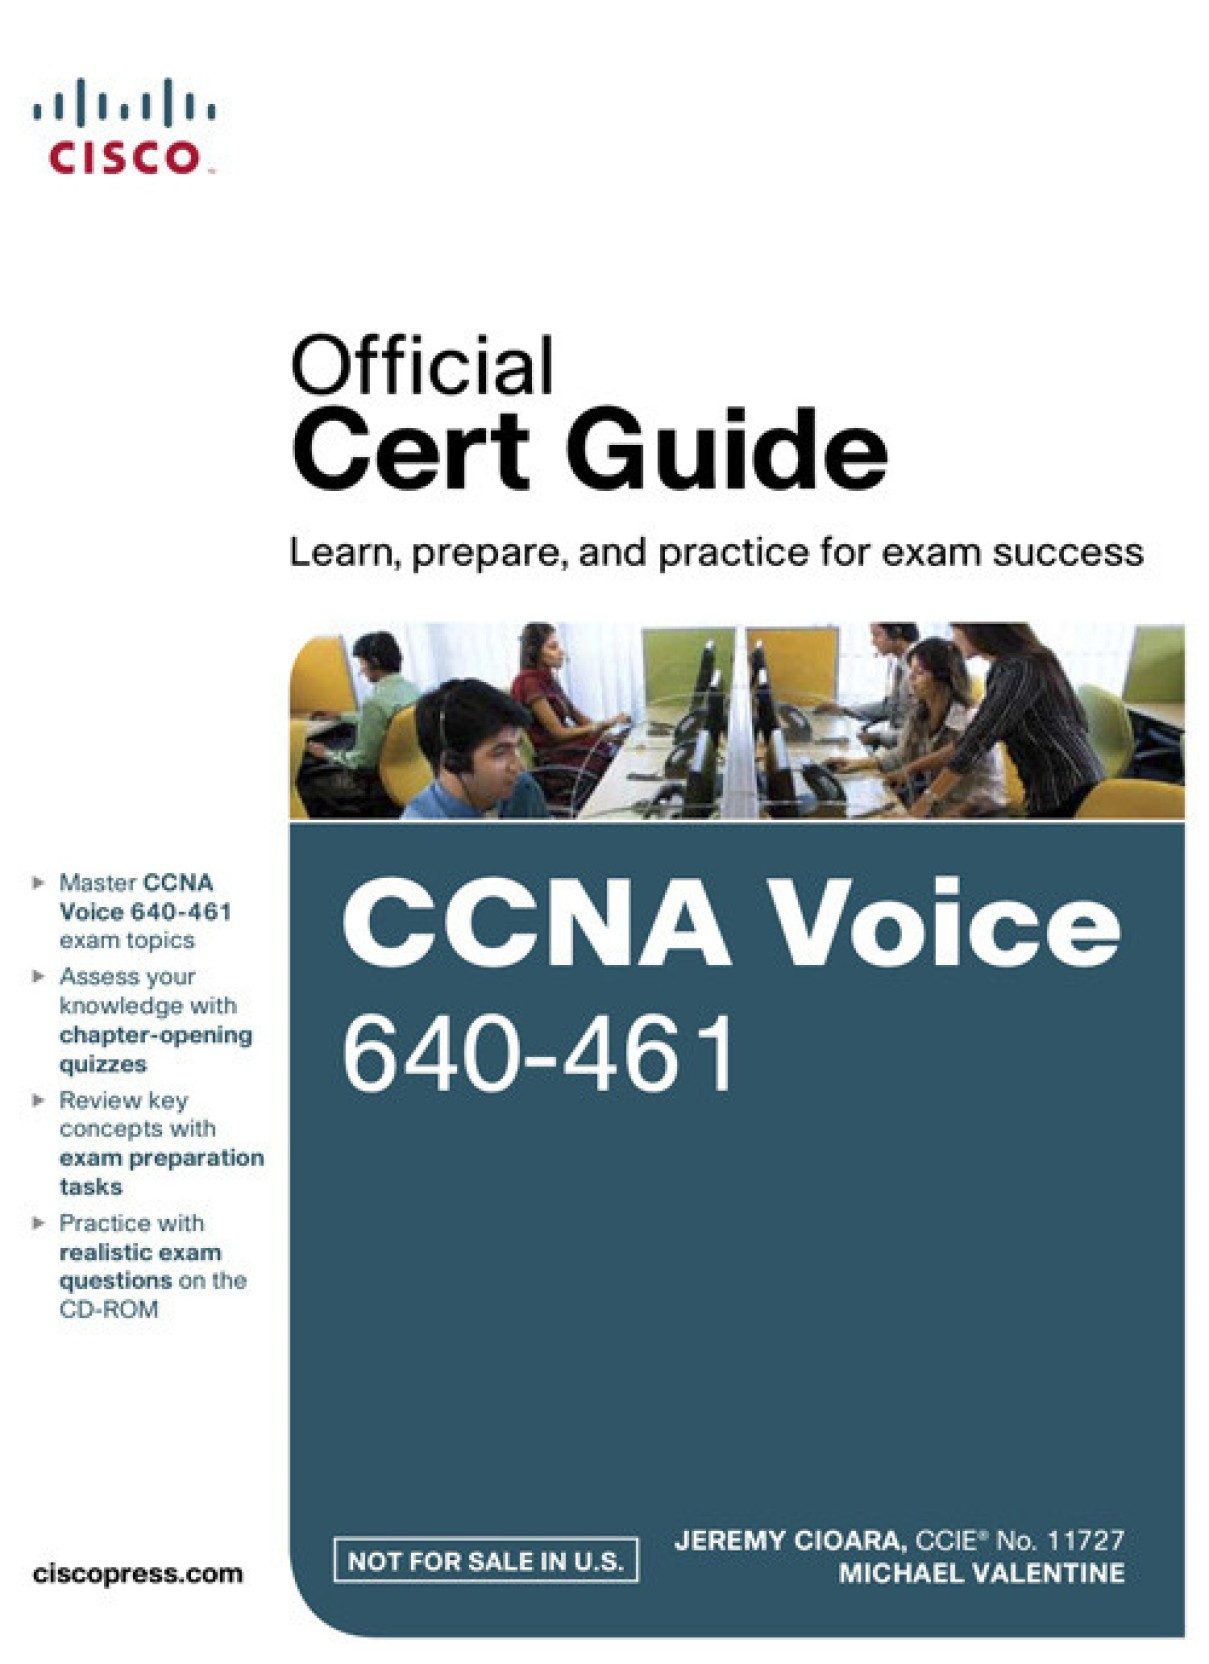 Download CCNA Voice Study Guide: Exam 640-460 Pdf Ebook